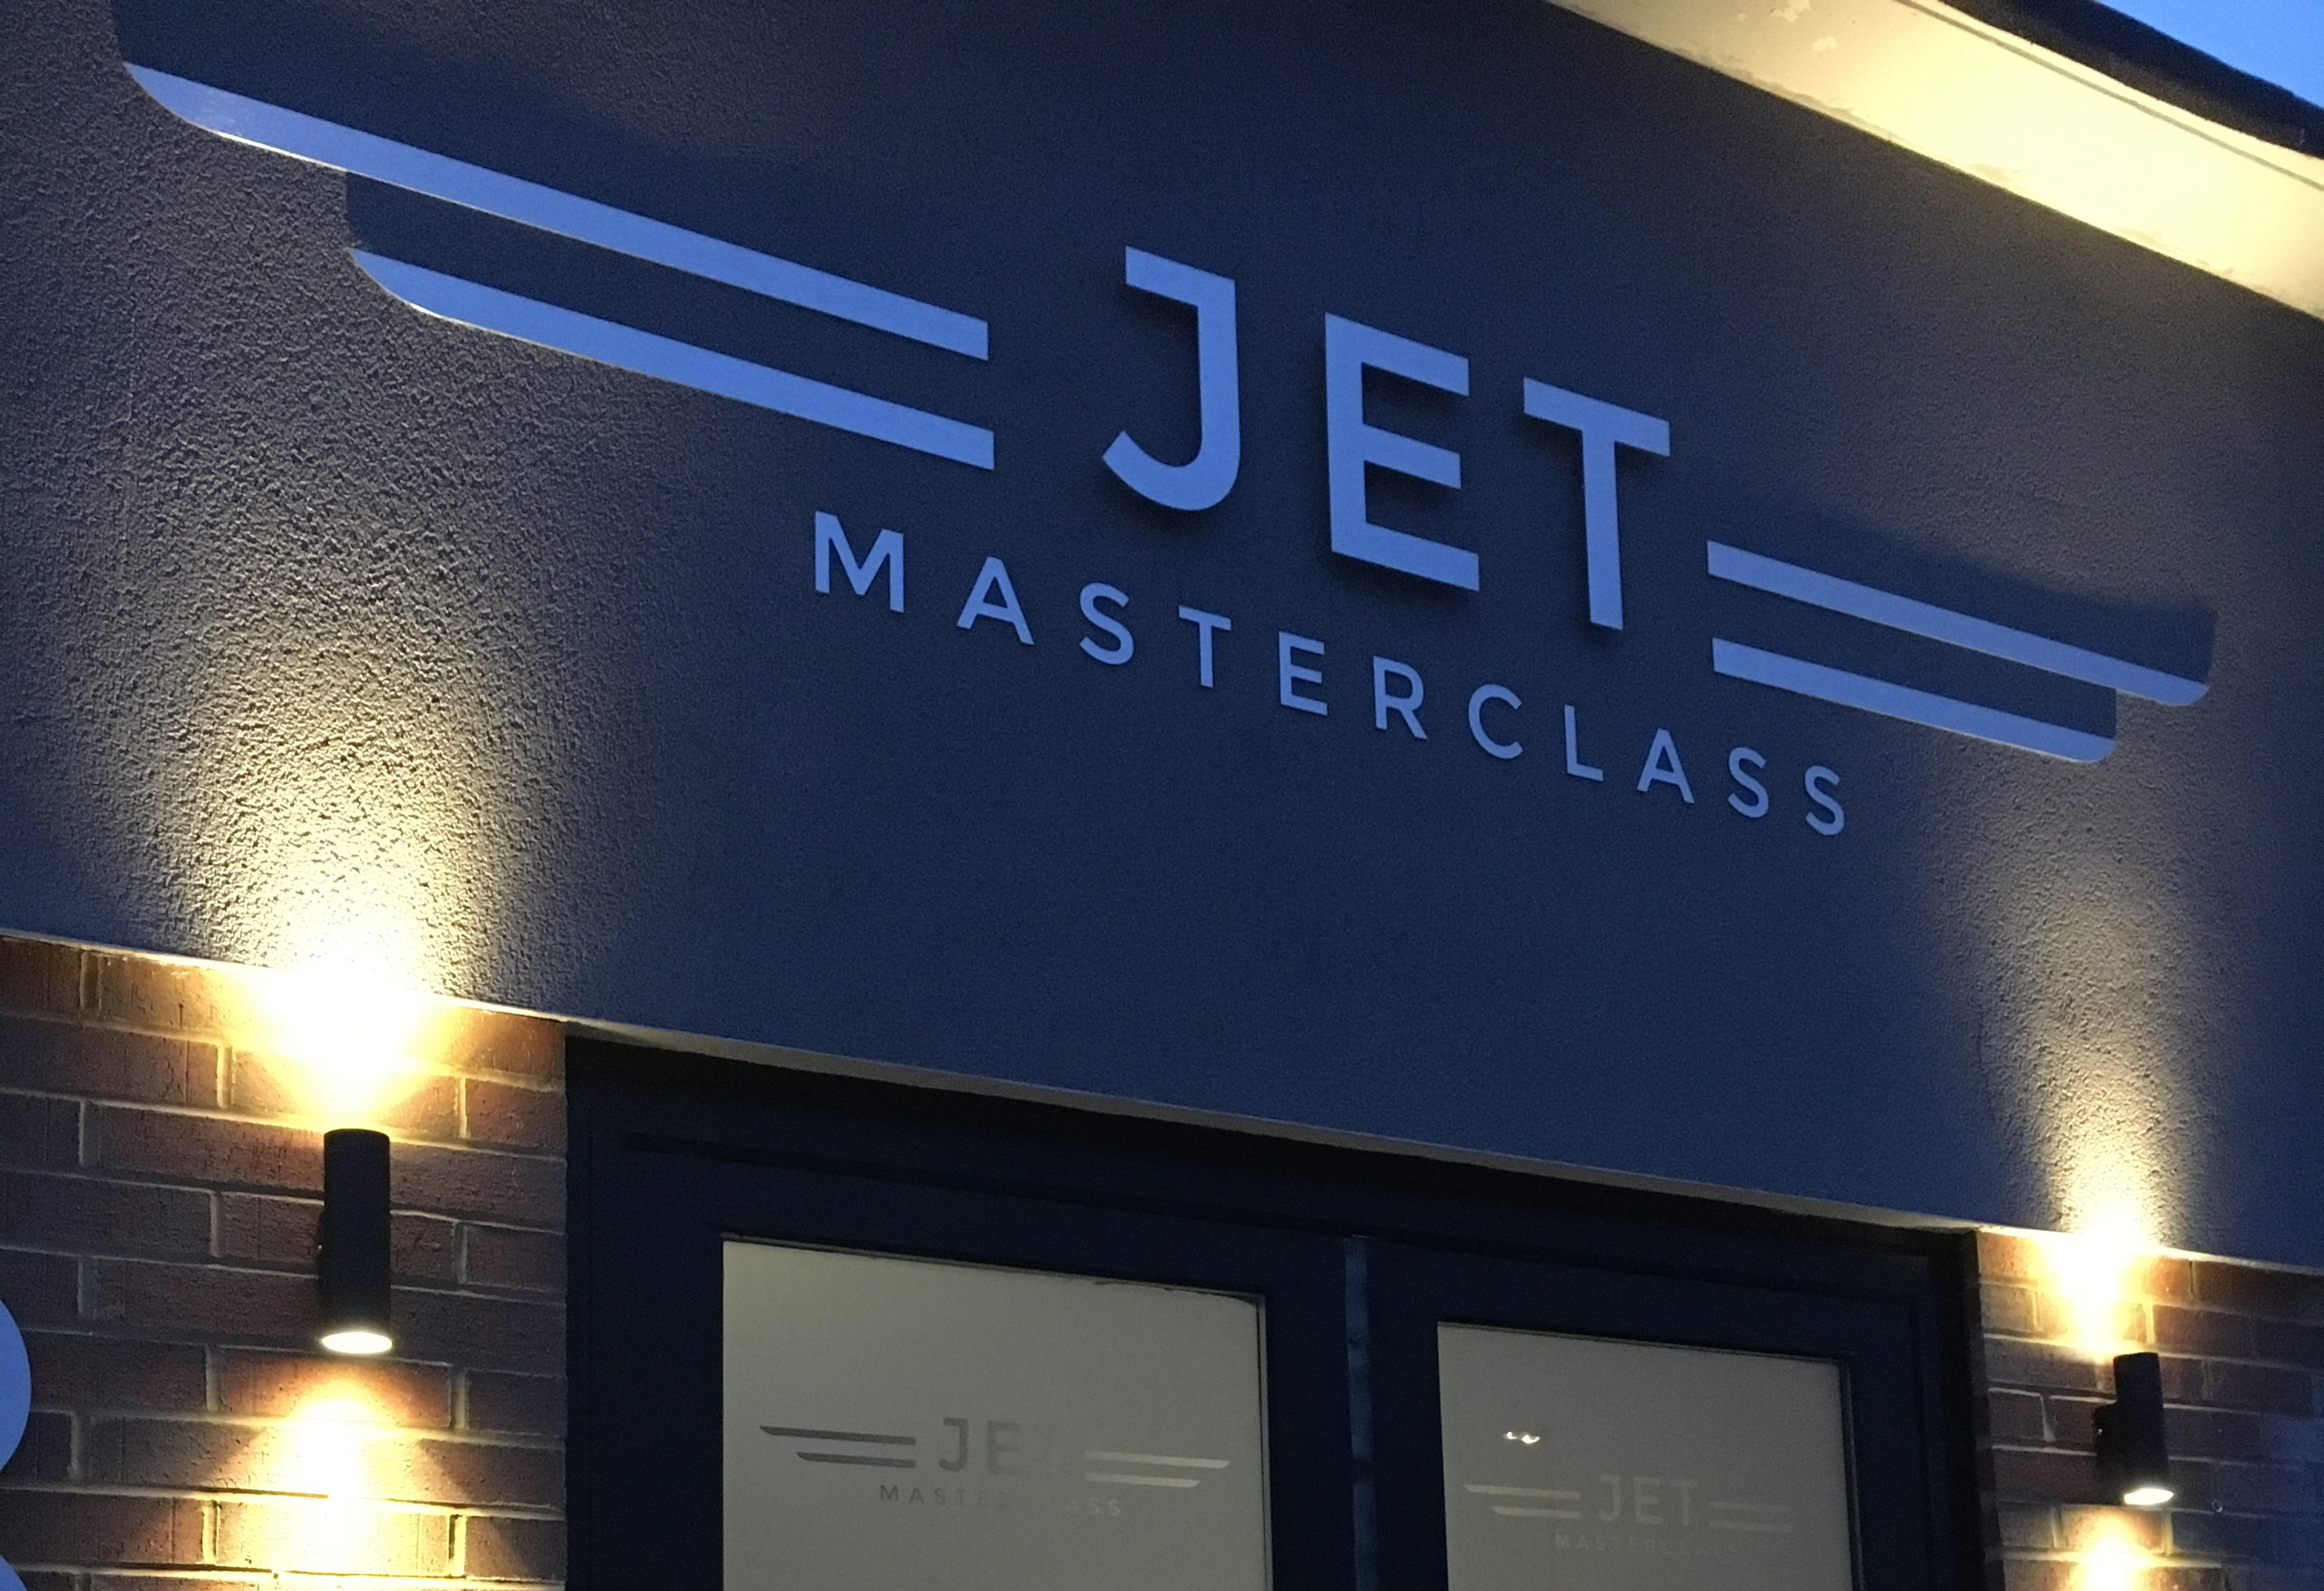 JETMASTERCLASS-SIGN